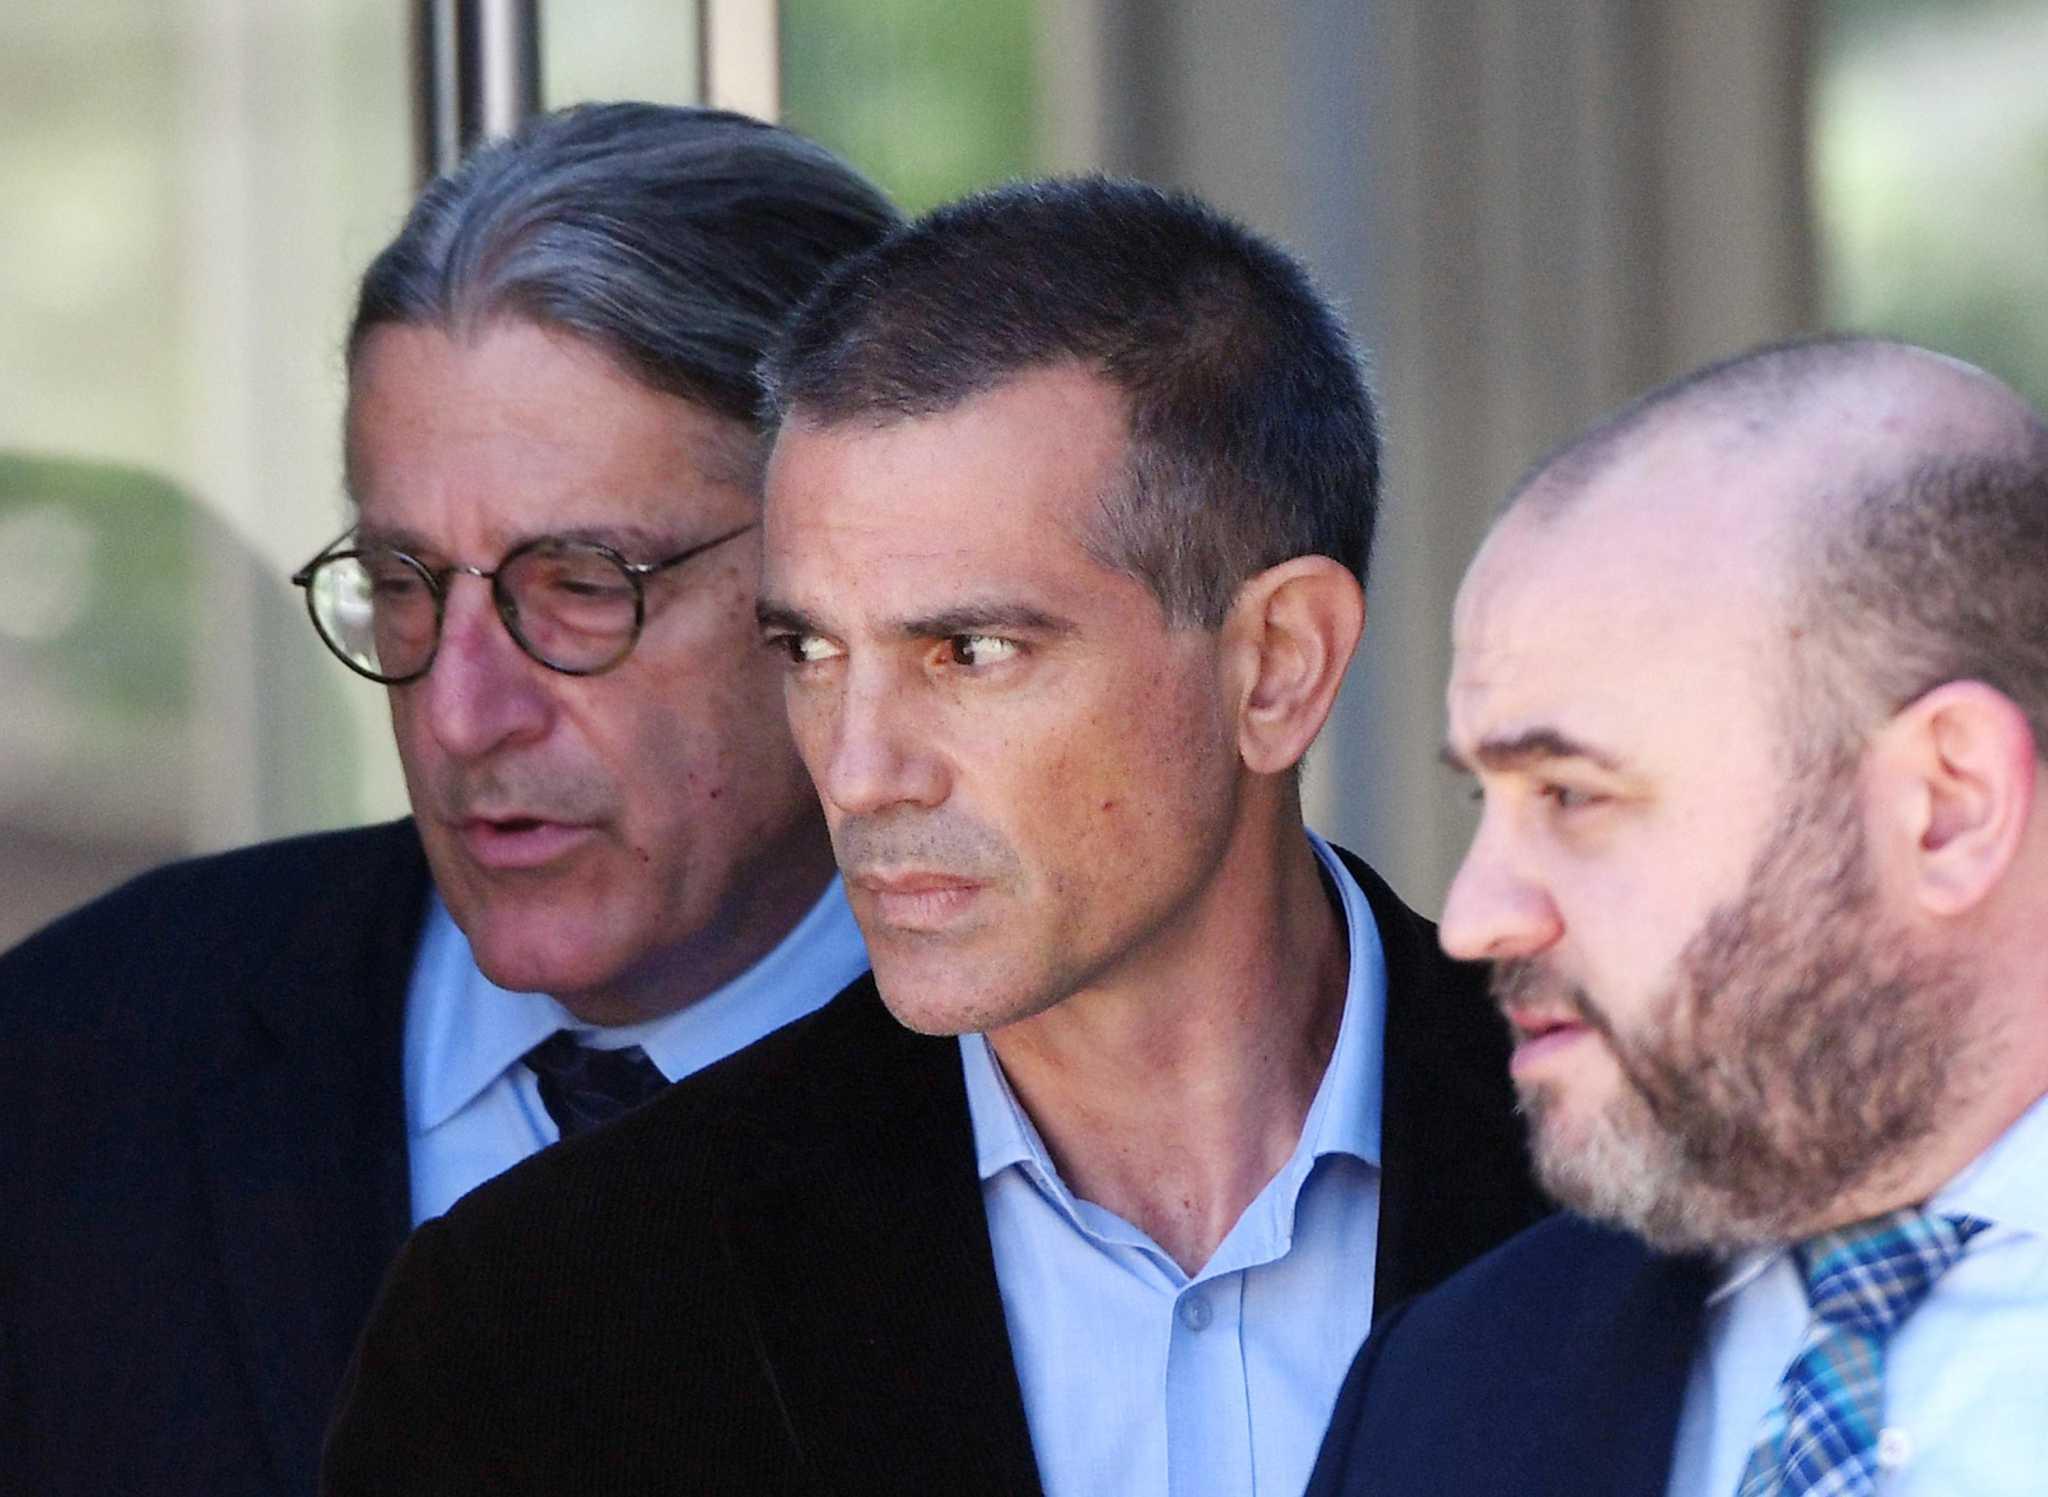 OJ Simpson, Casey Anthony investigator hired by defense in Jennifer Dulos case